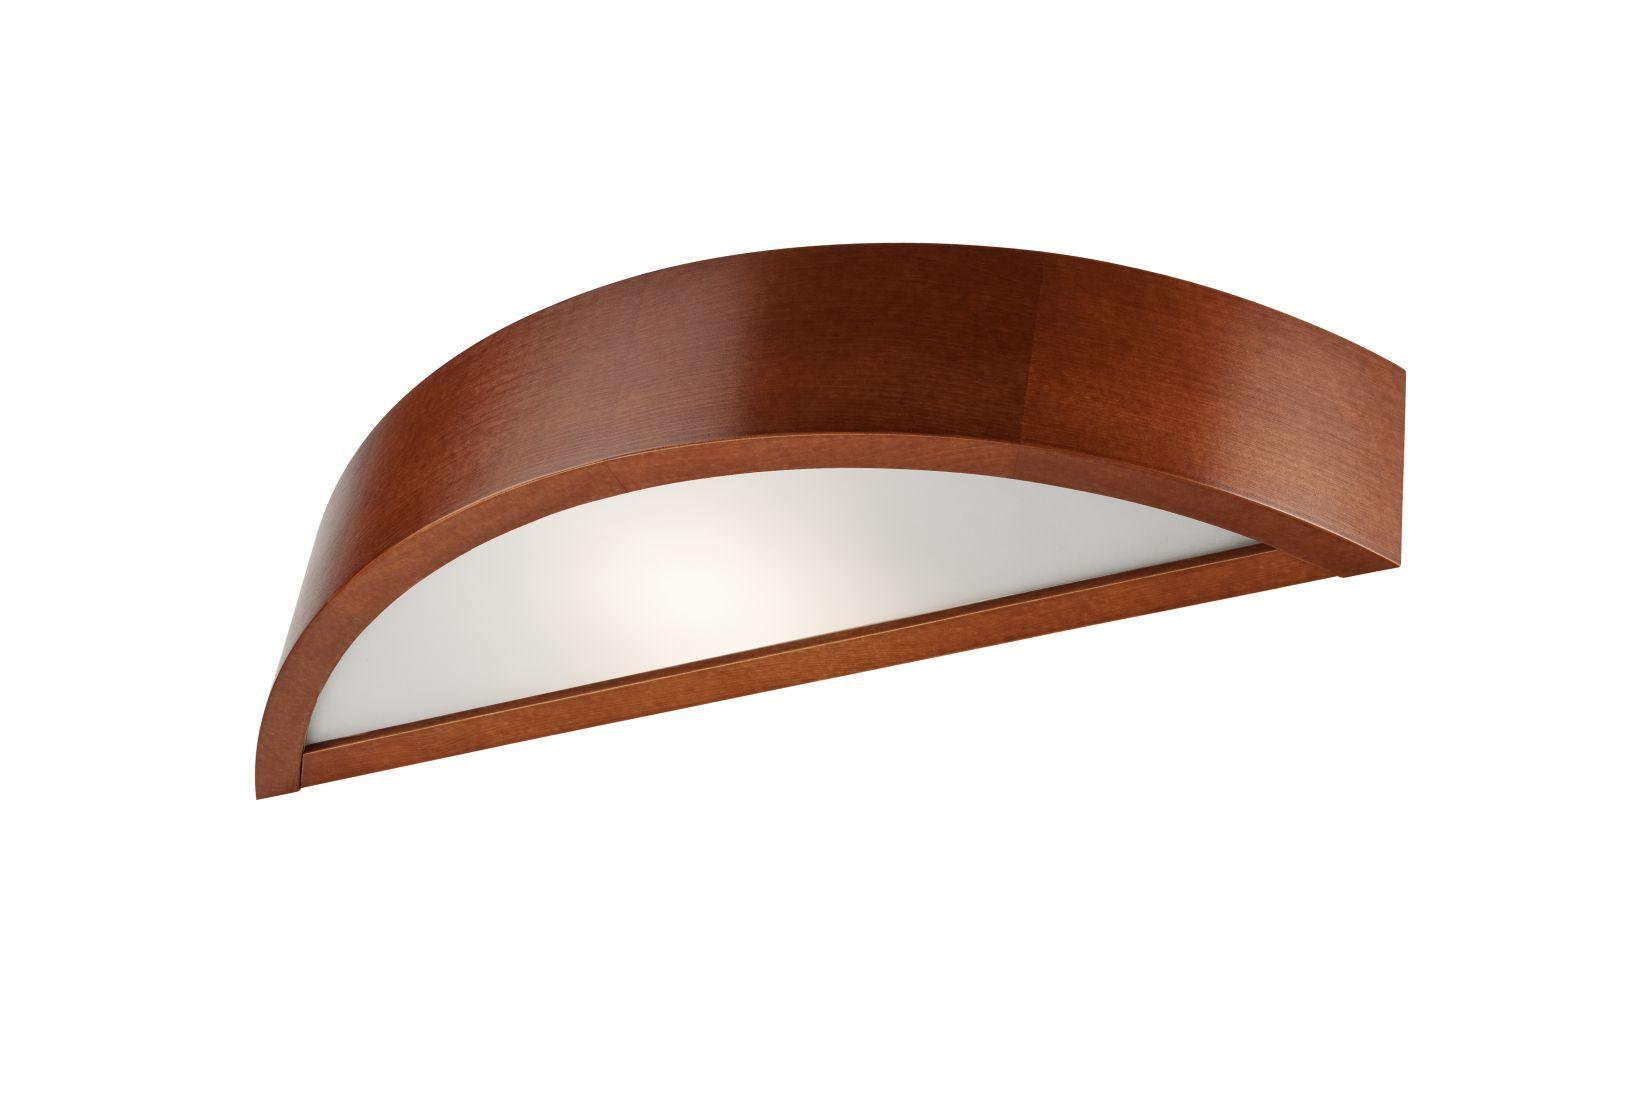 Wandleuchte Holz Flurlampe 40cm vielseitig RUDYARD